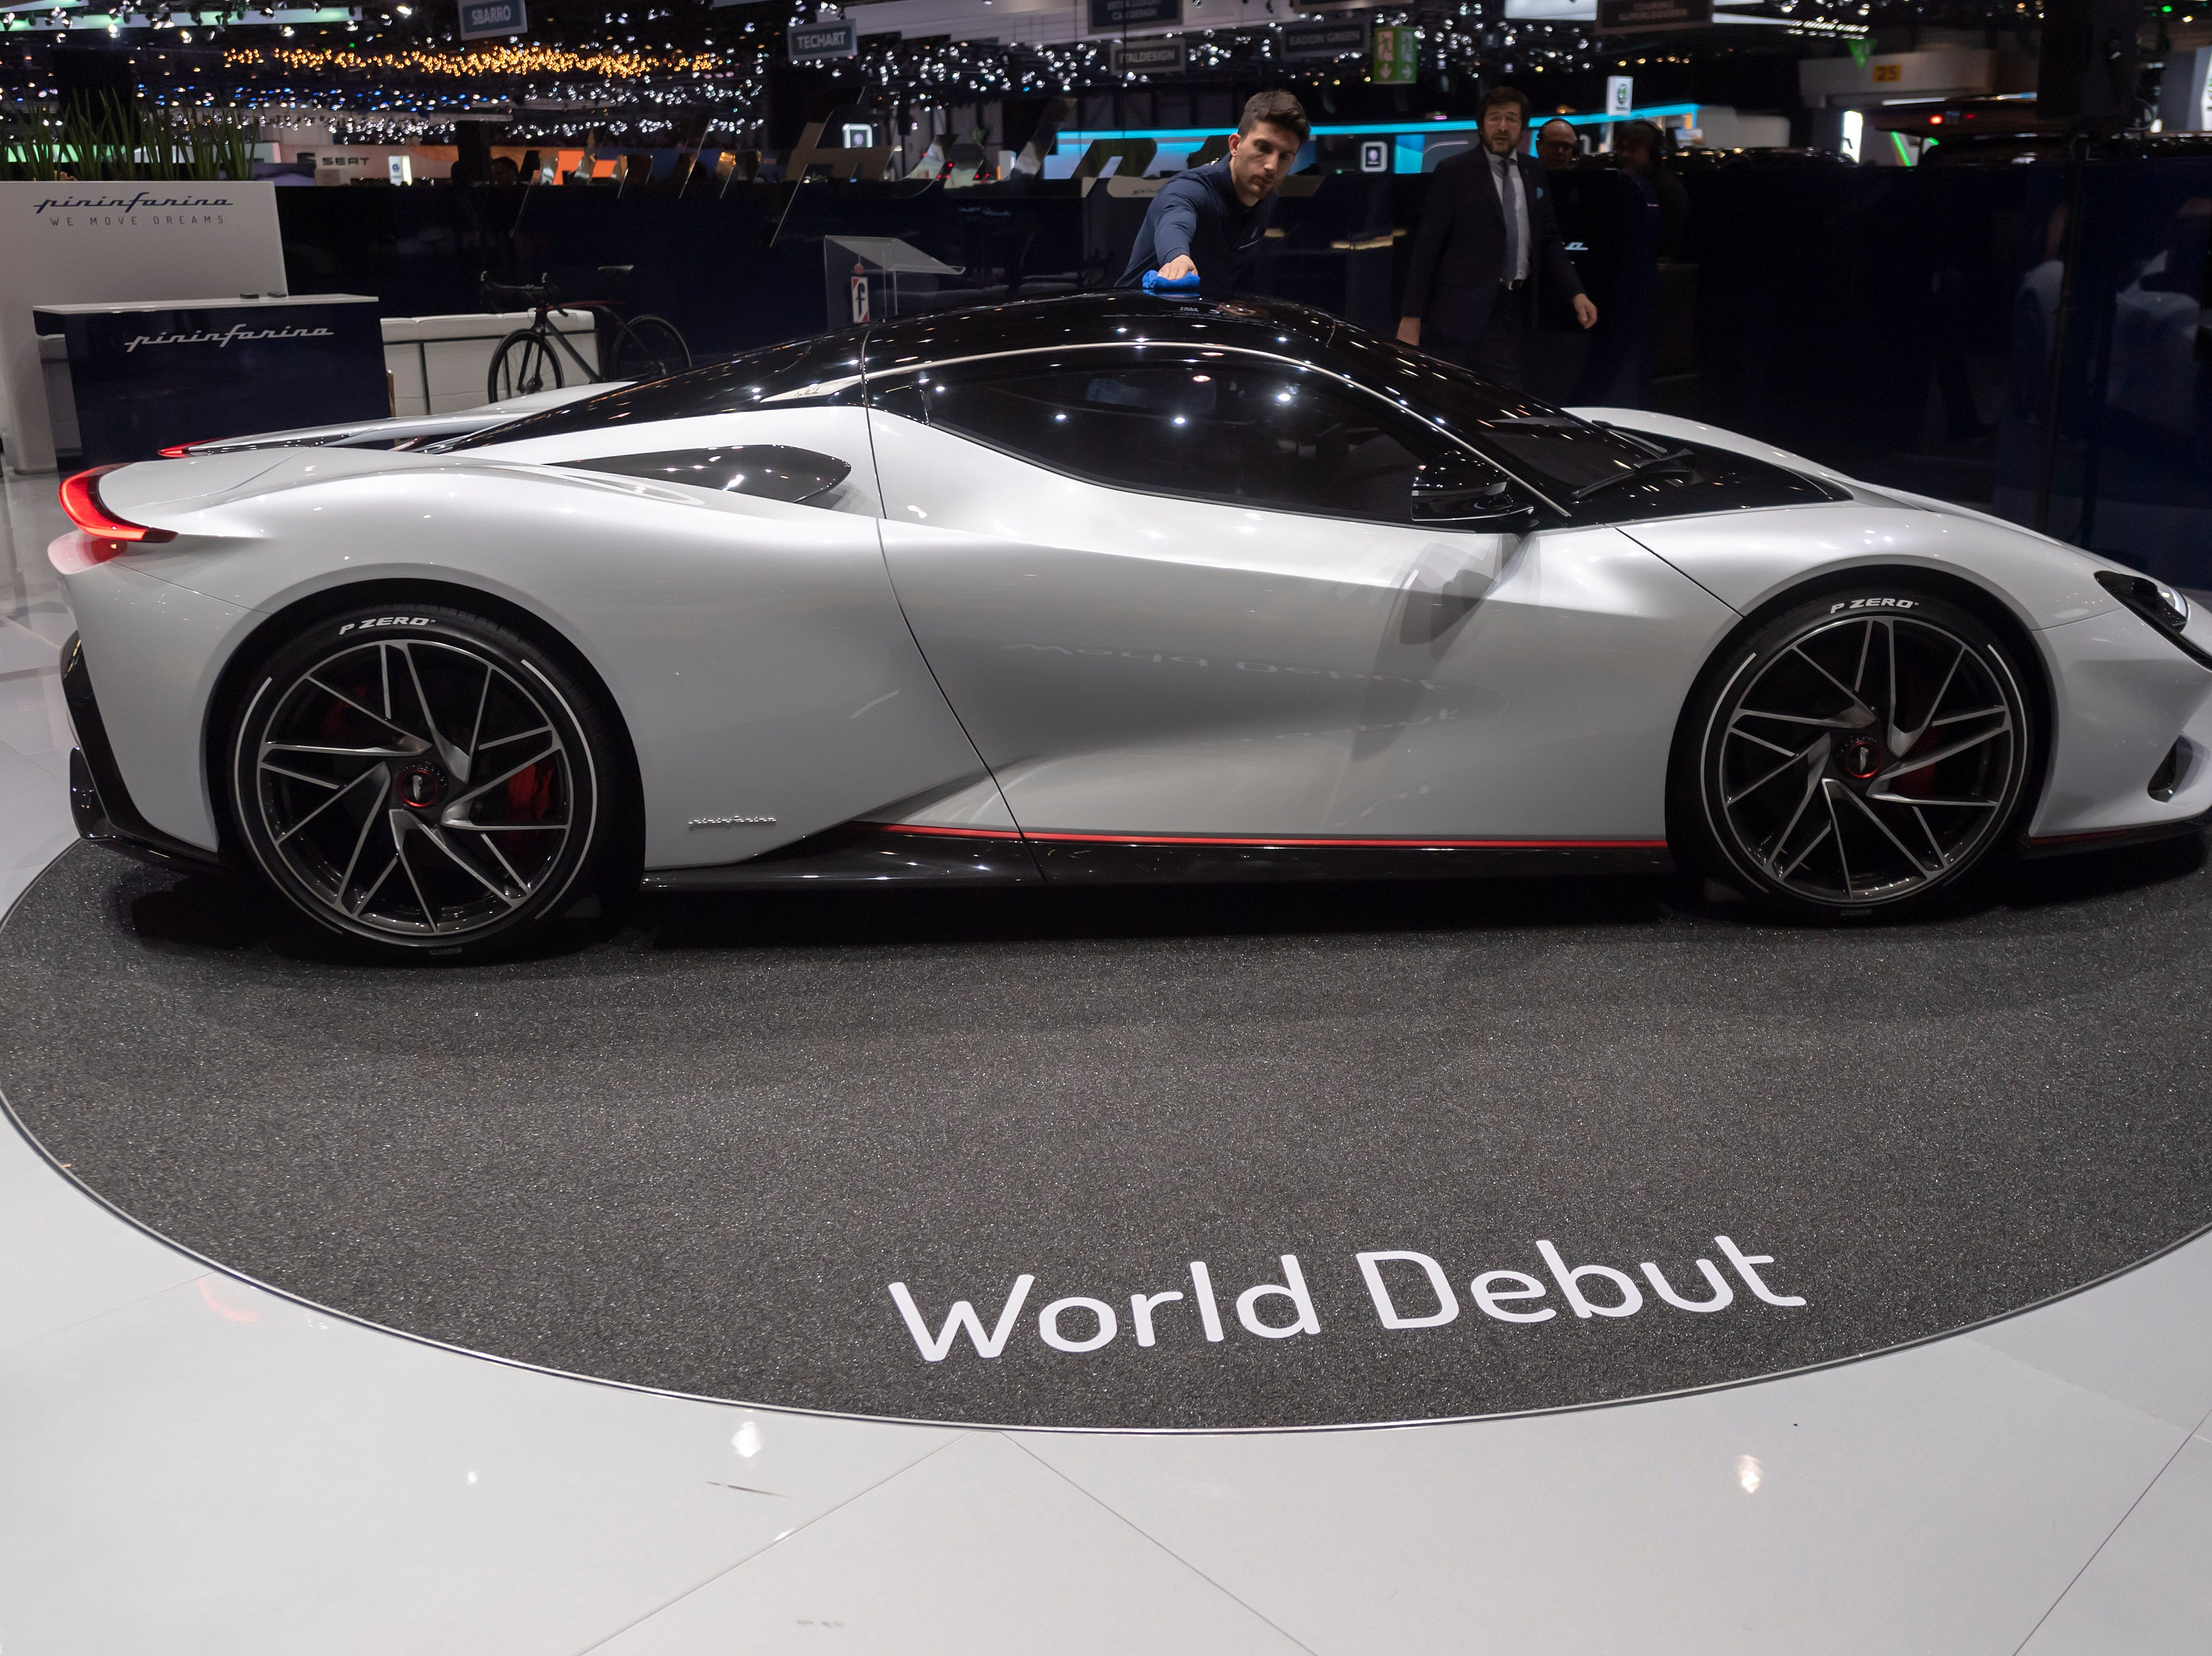 The Pininfarina Battista is polished at the Geneva International Motor Show in Geneva, Switzerland.